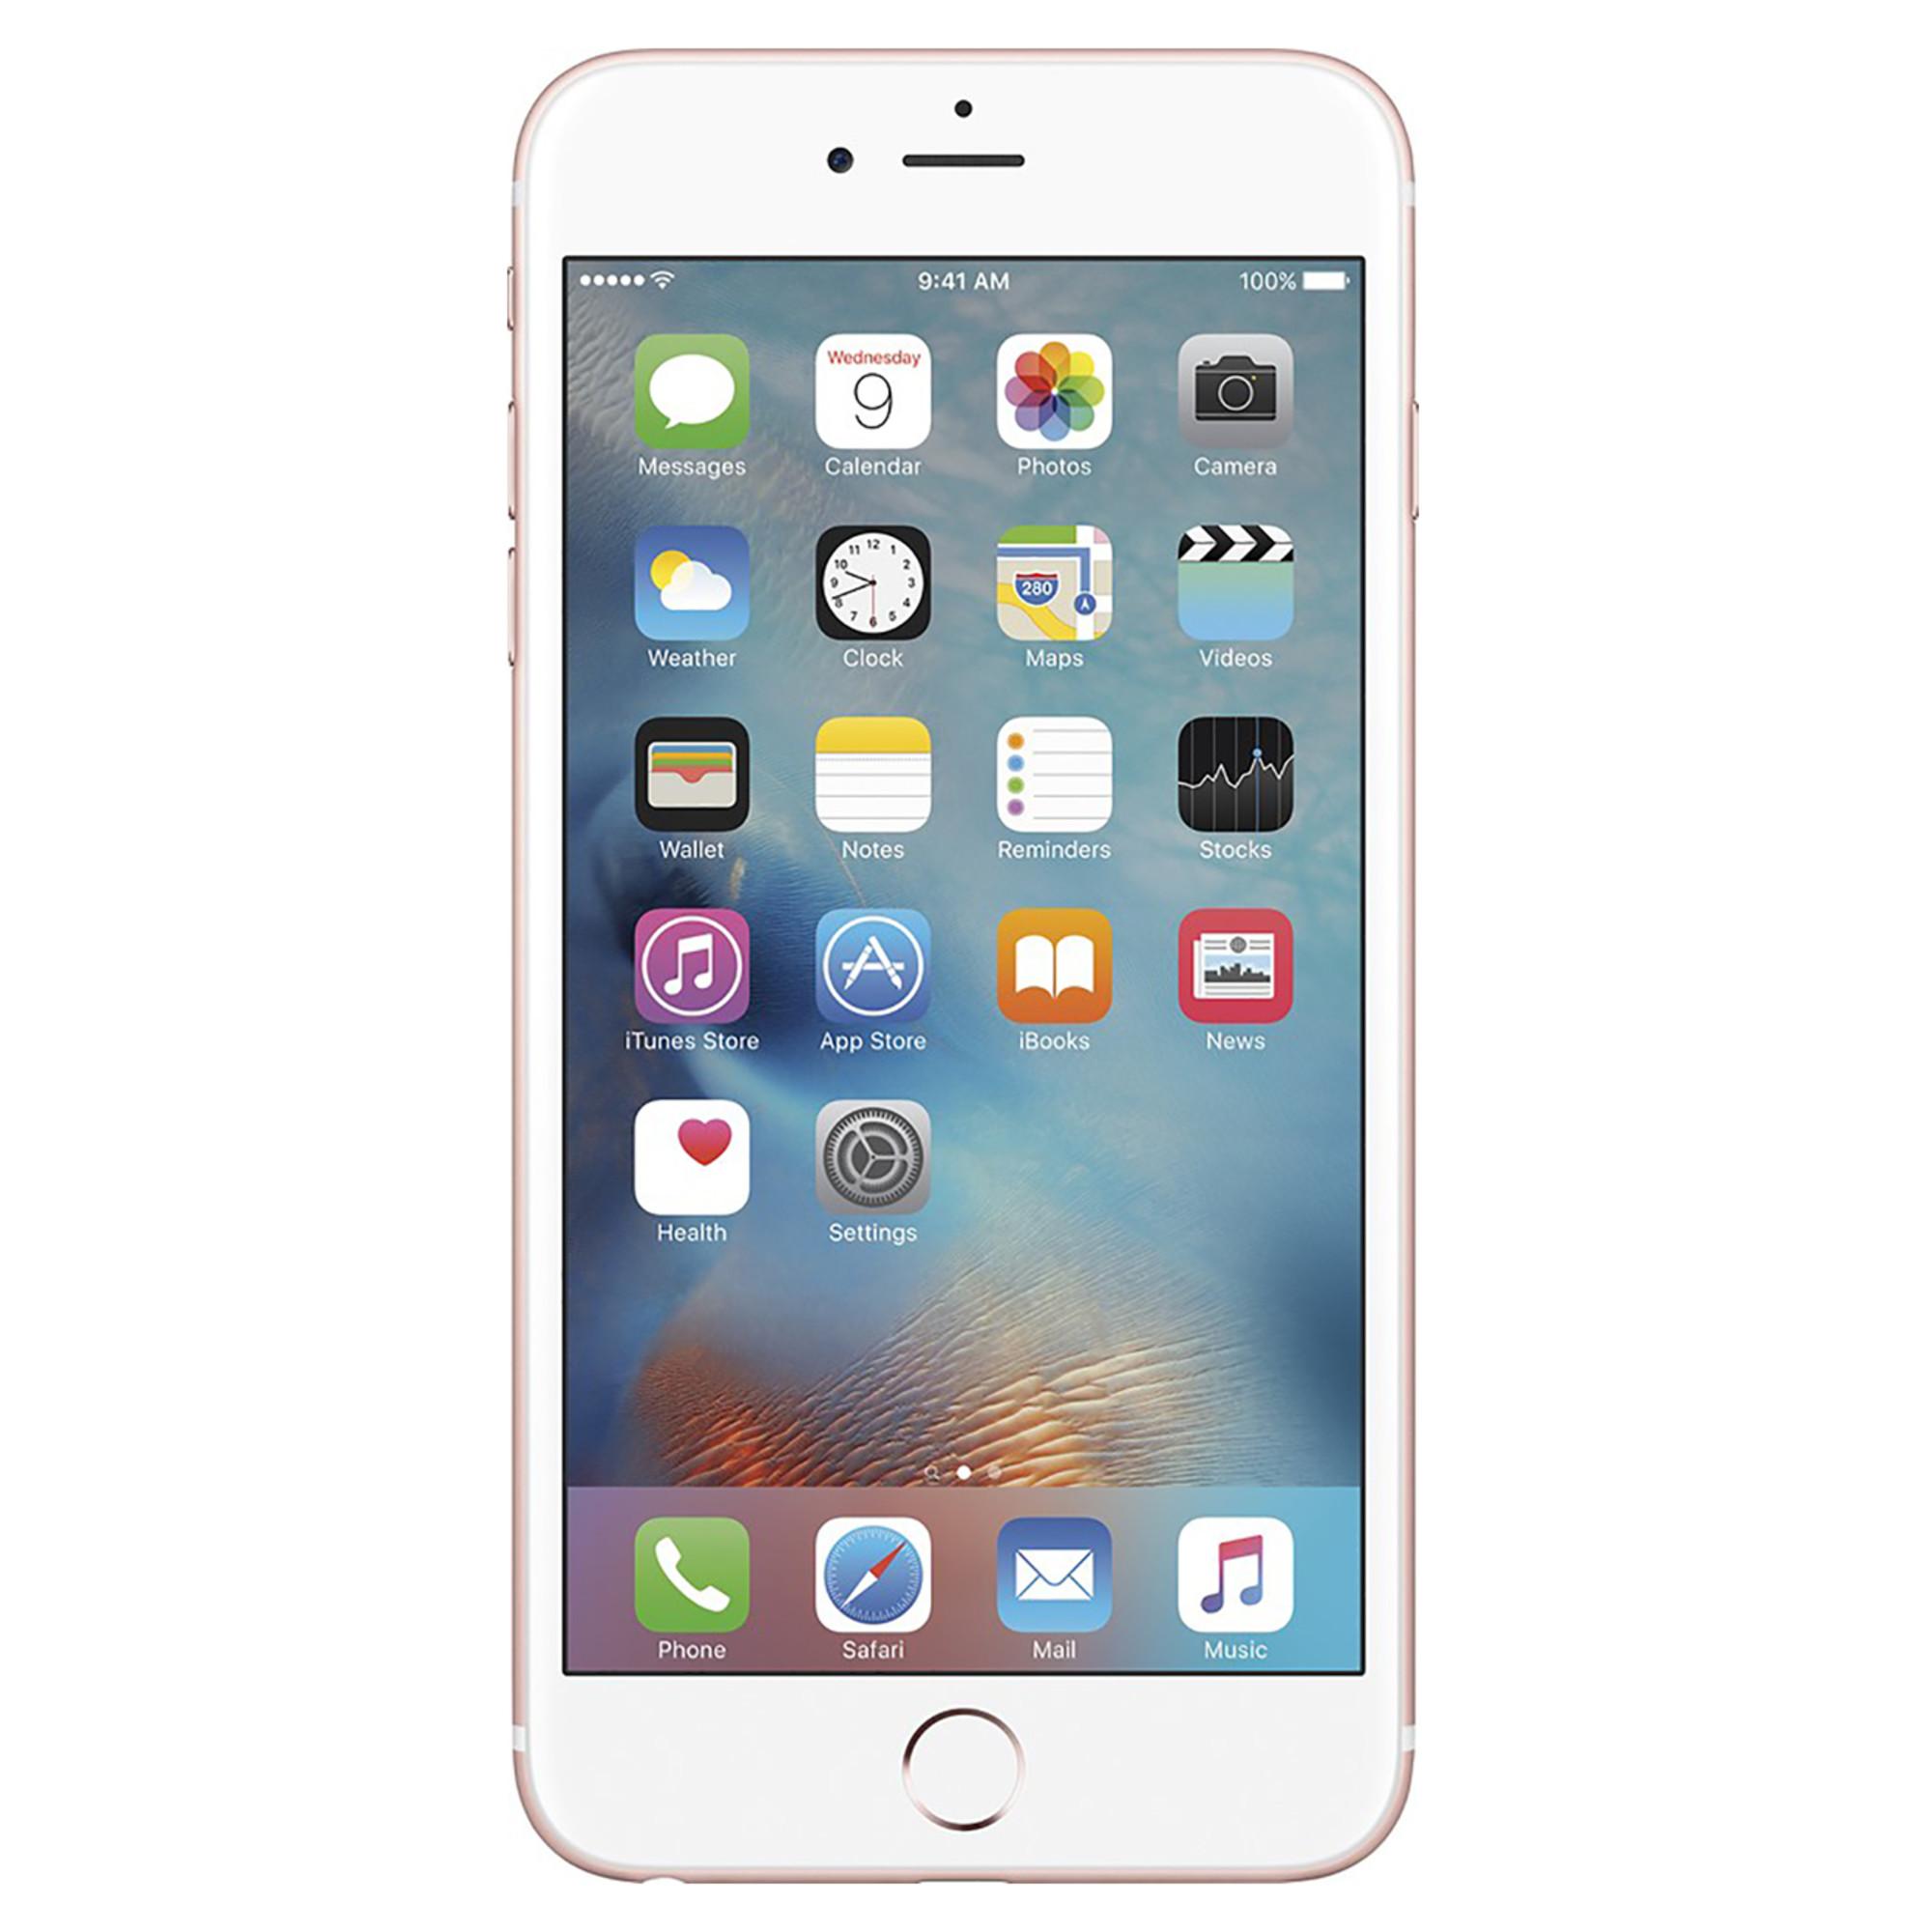 Apple iPhone 6s Plus 16GB Unlocked GSM 4G LTE Dual-Core Phone w/ 12 MP Camera - Rose Gold